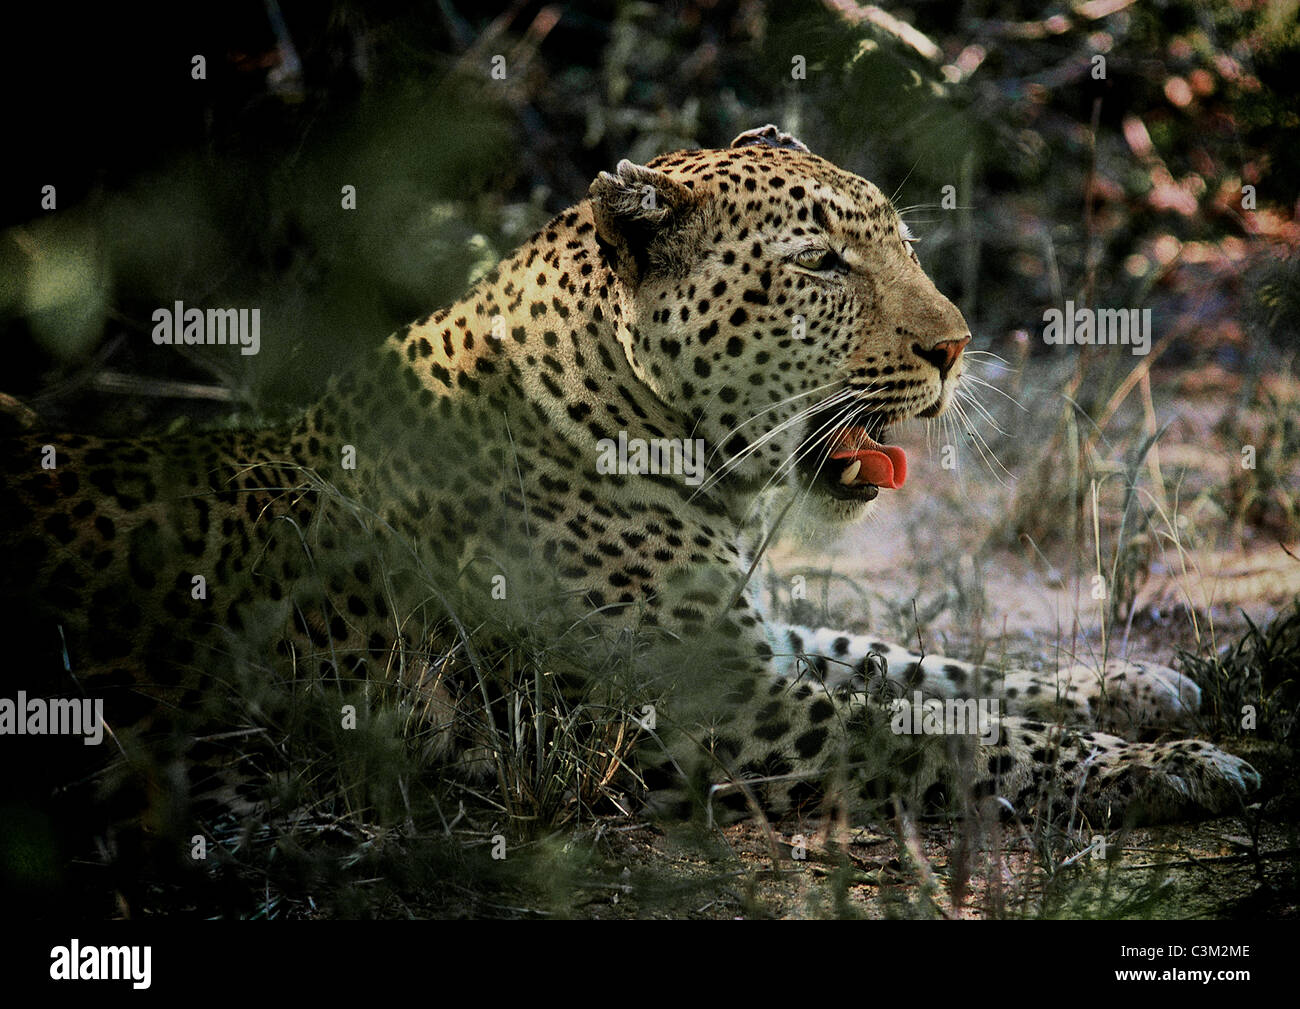 Leopard Panthera pardus Mala Mala Kruger South Africa - Stock Image